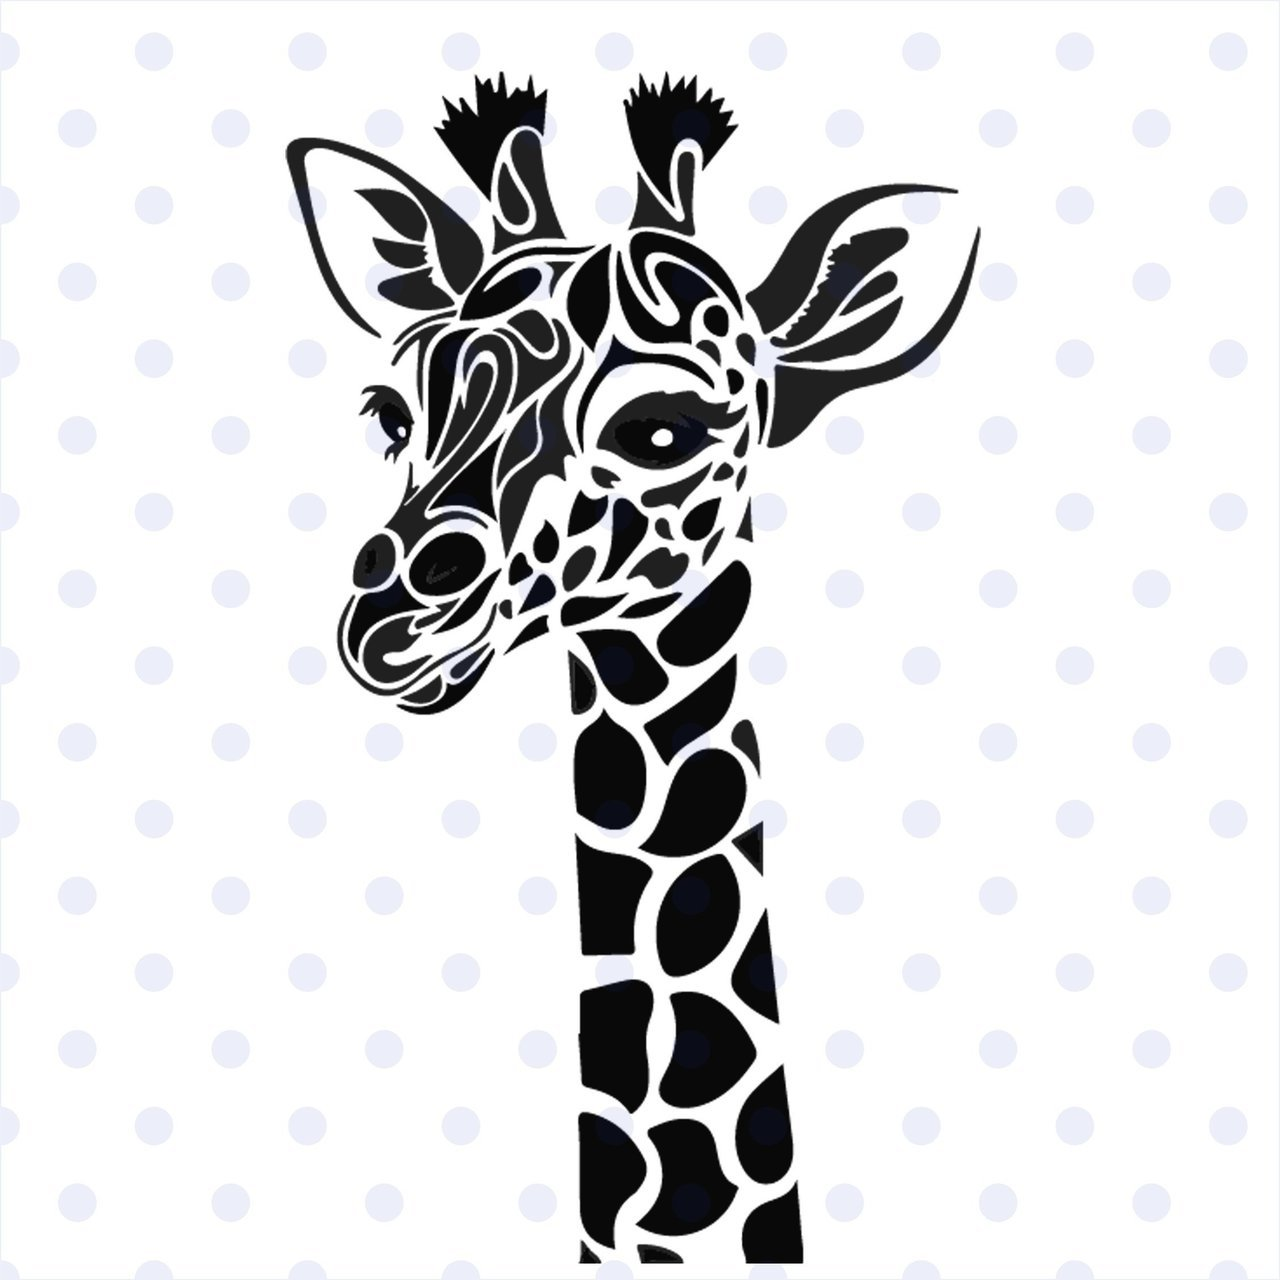 Giraffe svg Animal svg Giraffe clipart Zentangle Giraffe SVG Giraffe  mandala silhouette svg Giraffe shirt SVG DXF eps png pdf.